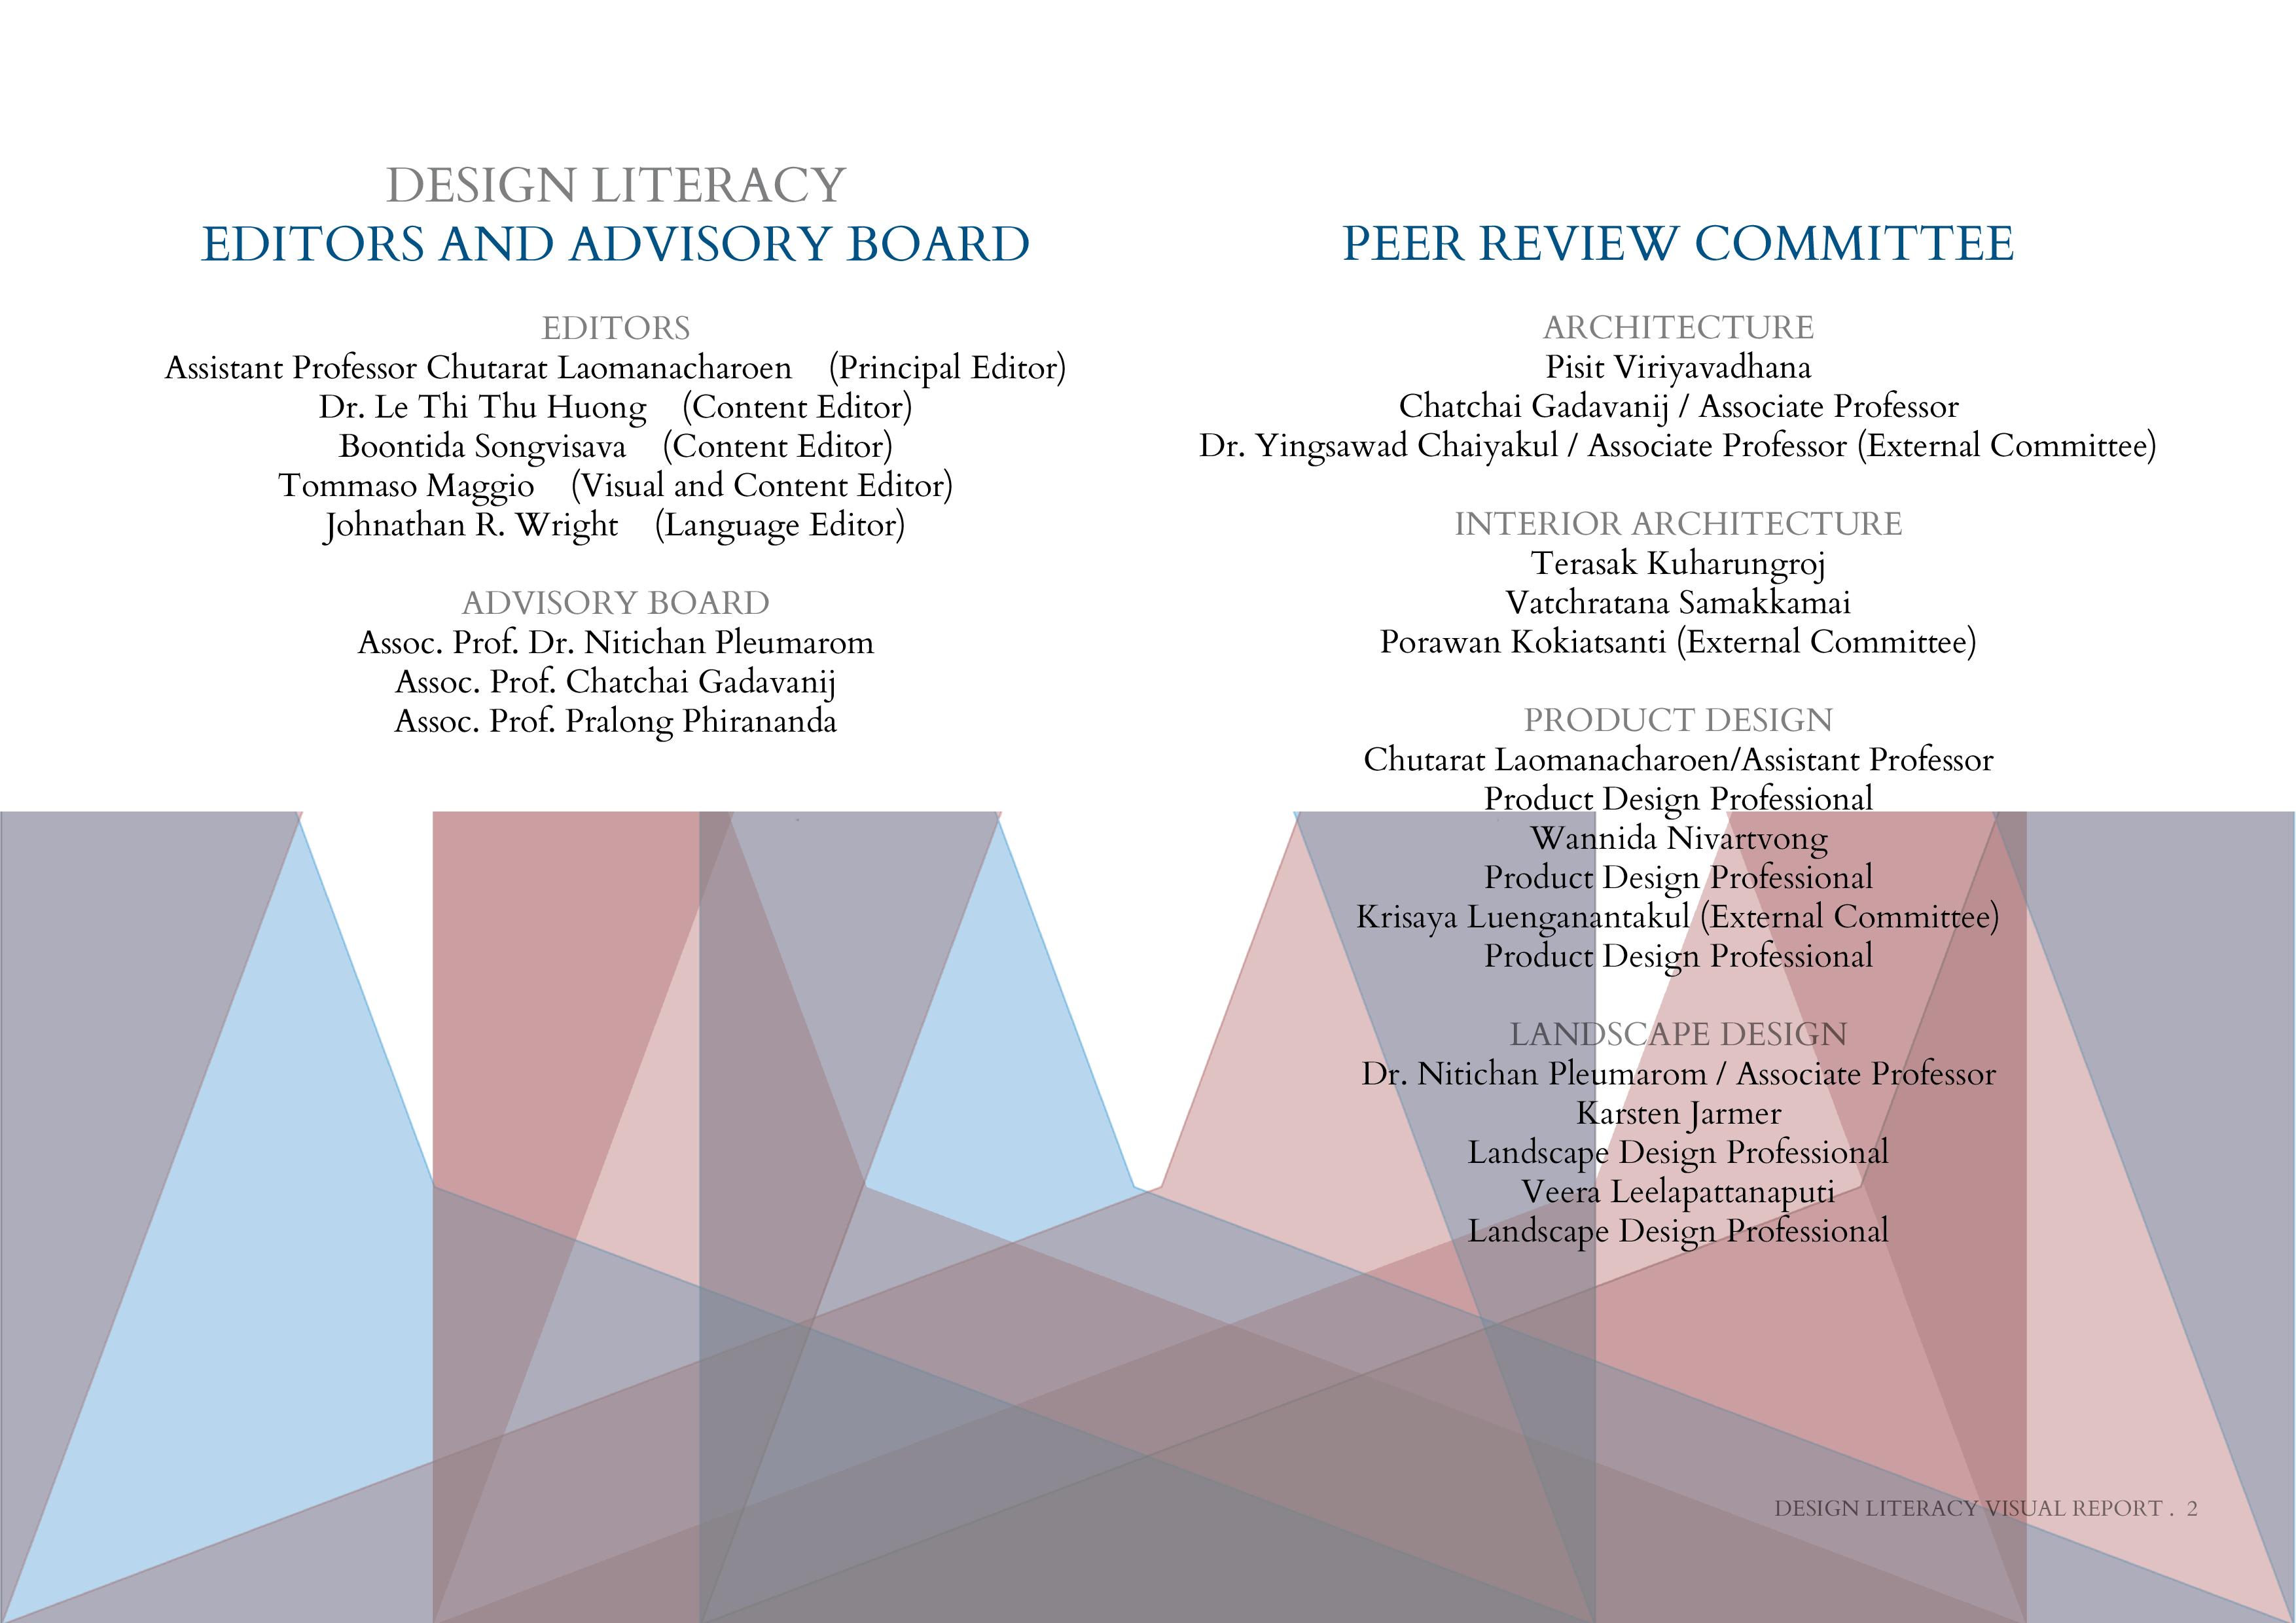 Design Literacy Forum II . Visual Report   Triangulum Network